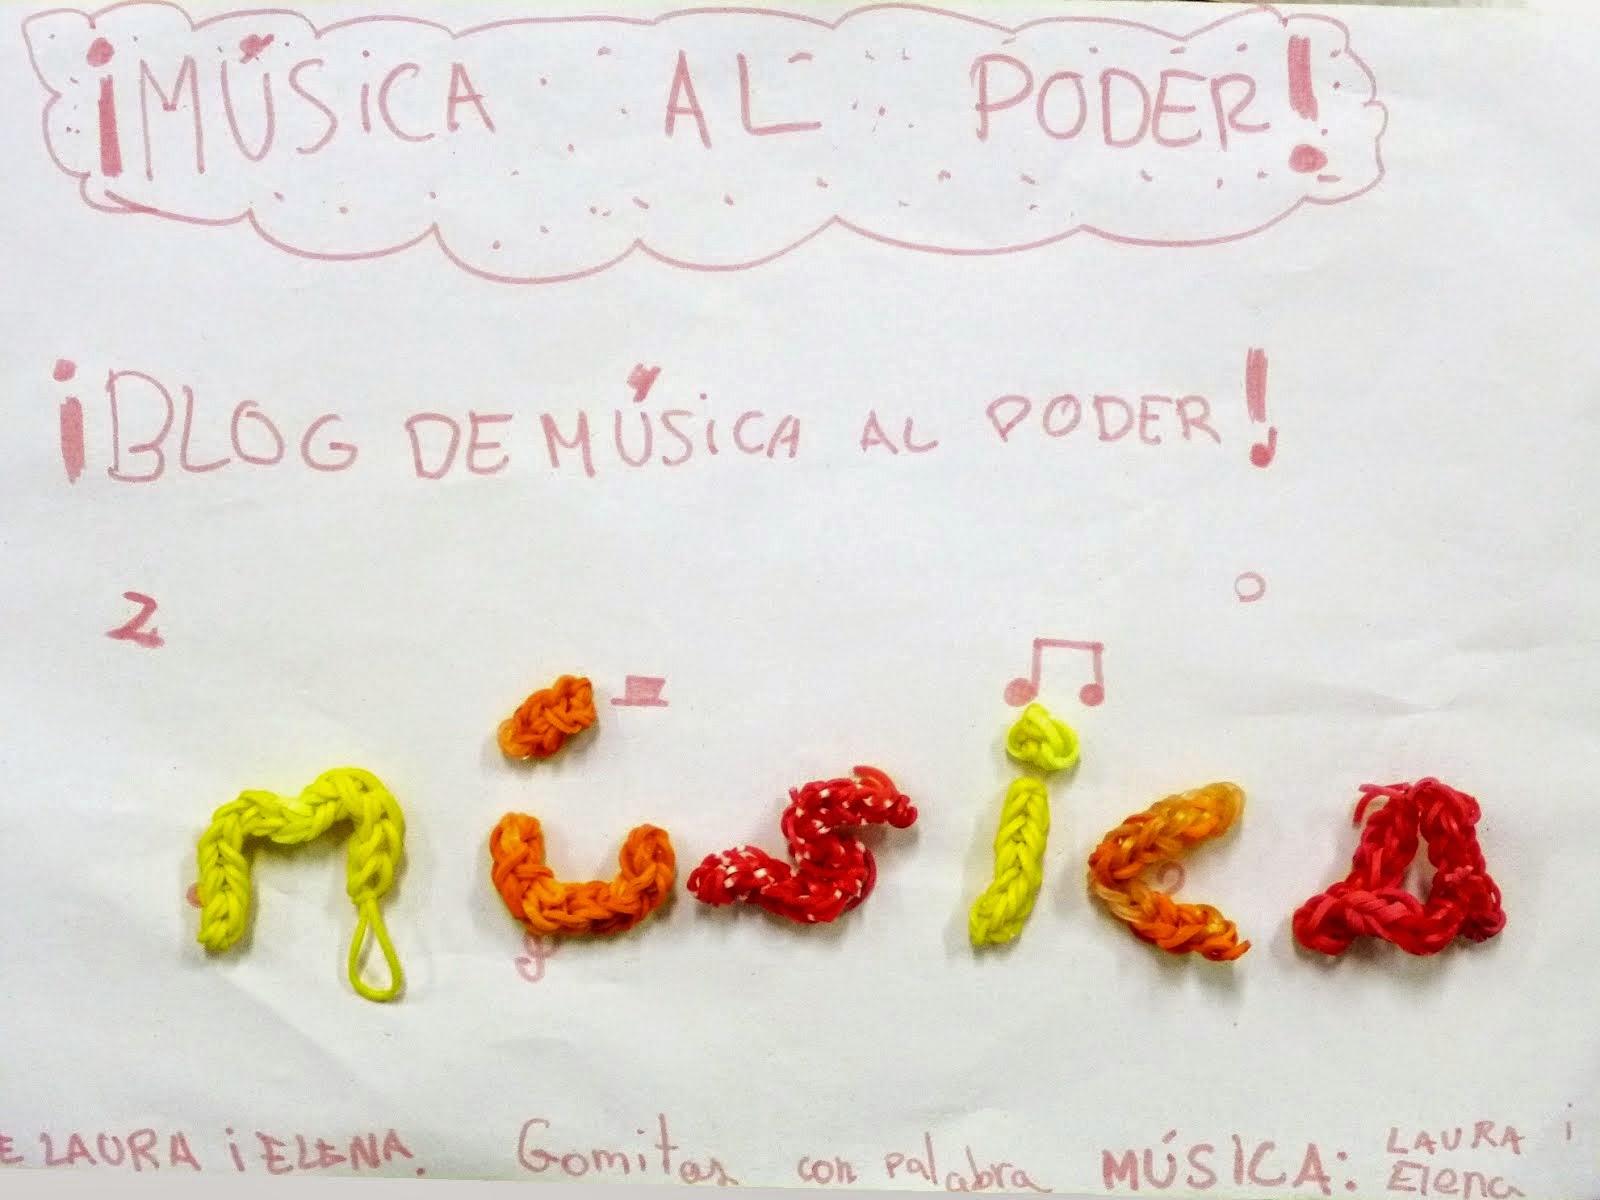 Blog de  Música al poder